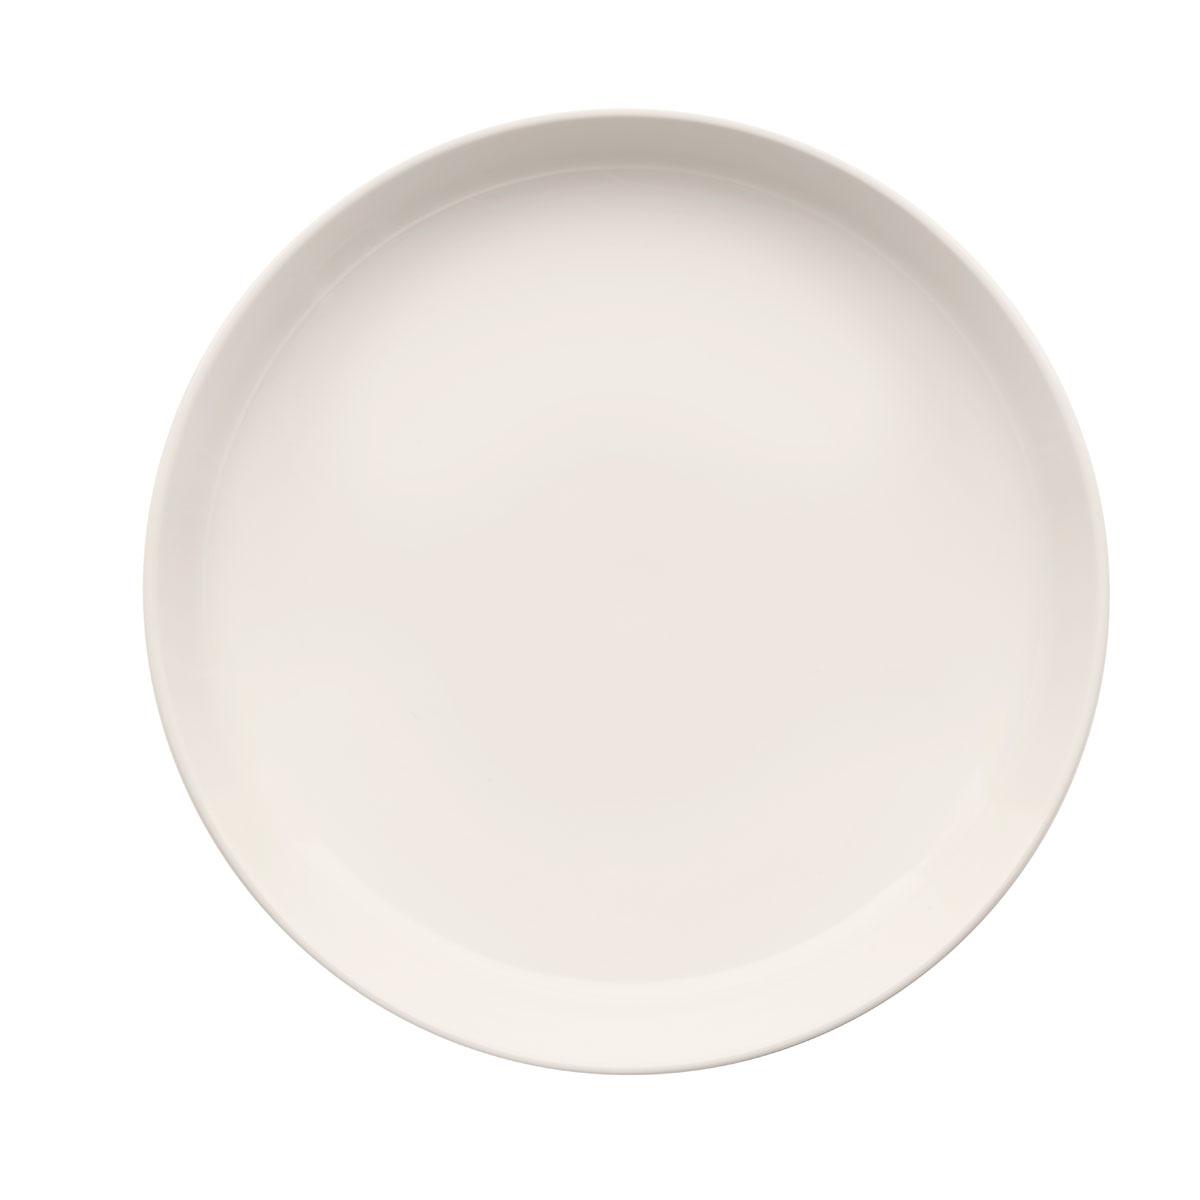 "Iittala Essence Bowl 8"" White"